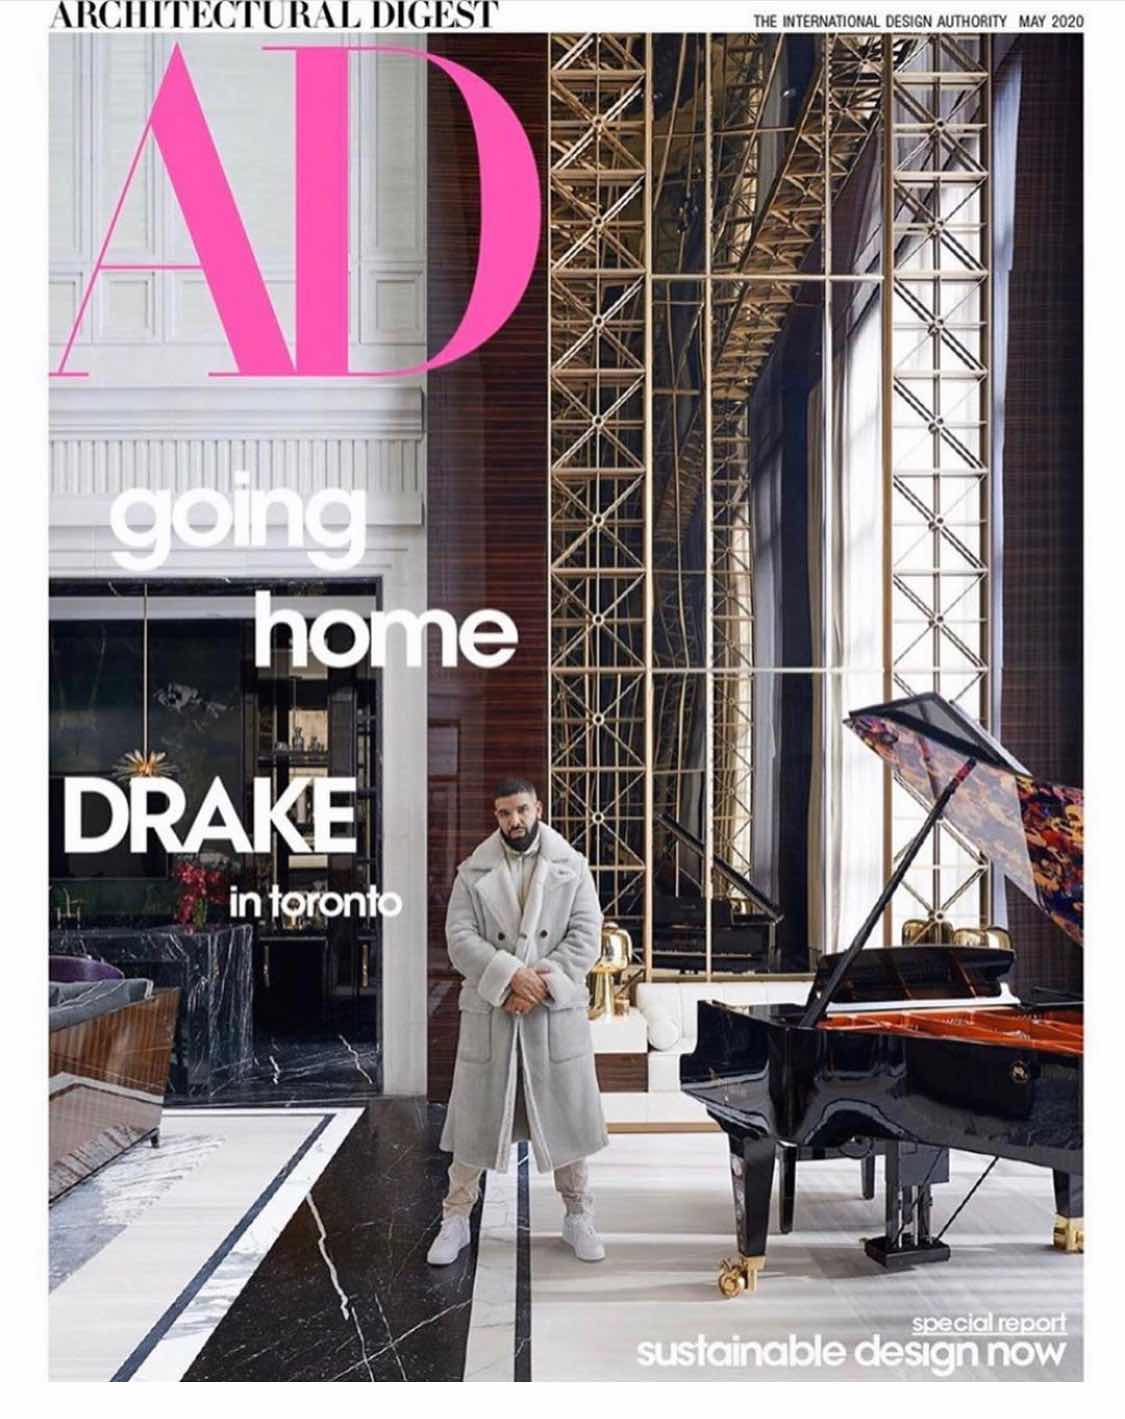 Inside Drake's Toronto Home